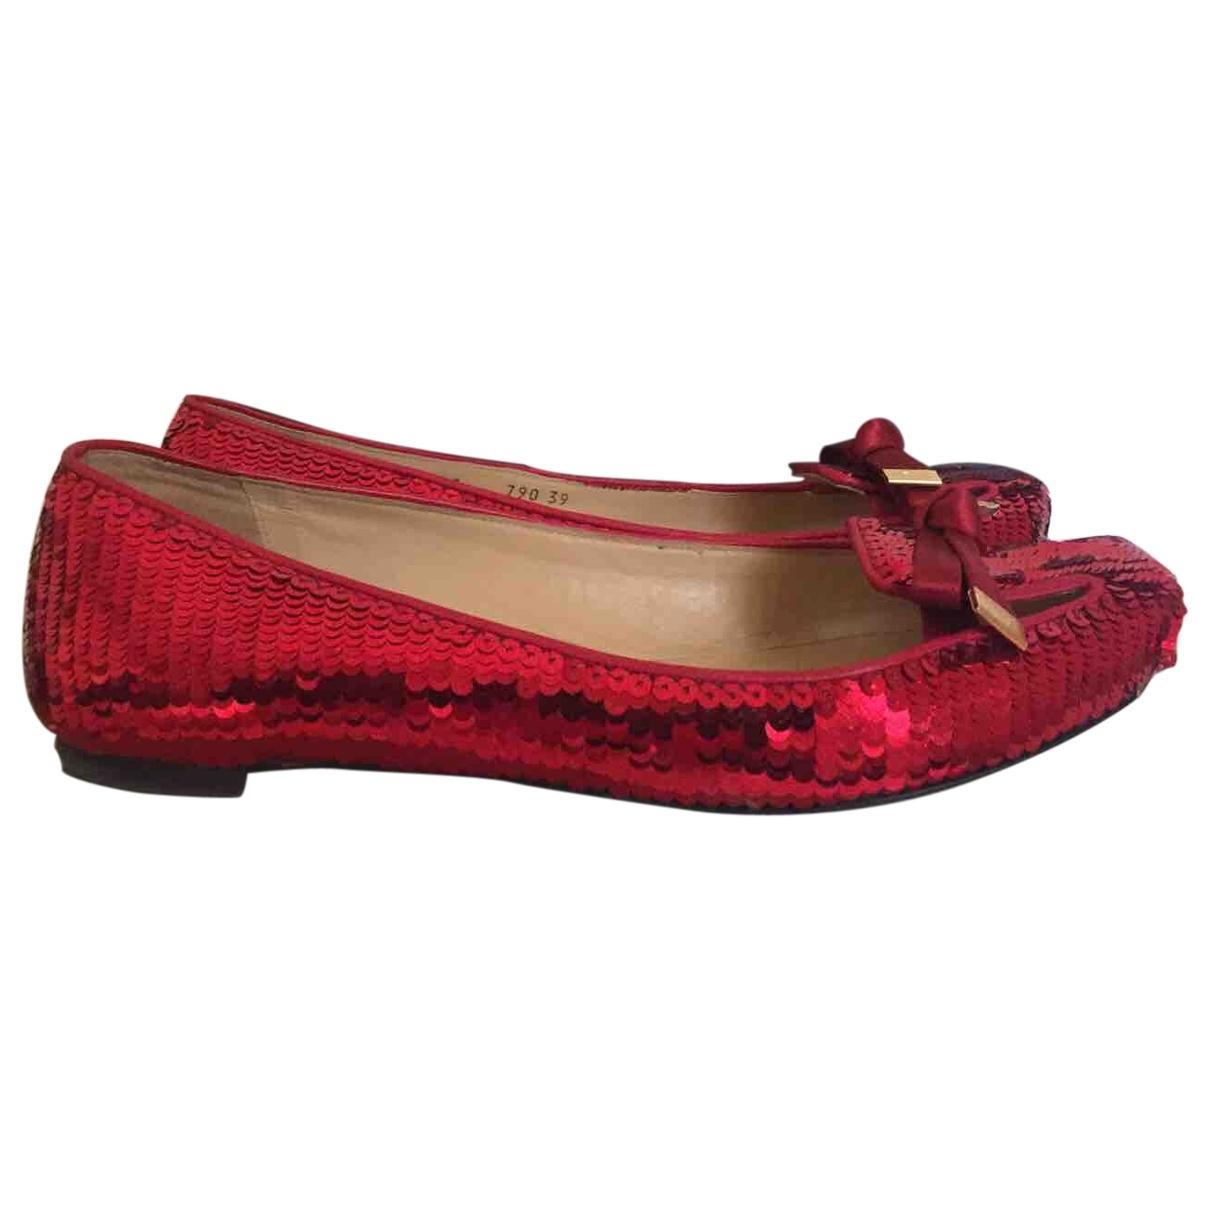 Emporio Armani \N Red Glitter Ballet flats for Women 39 EU